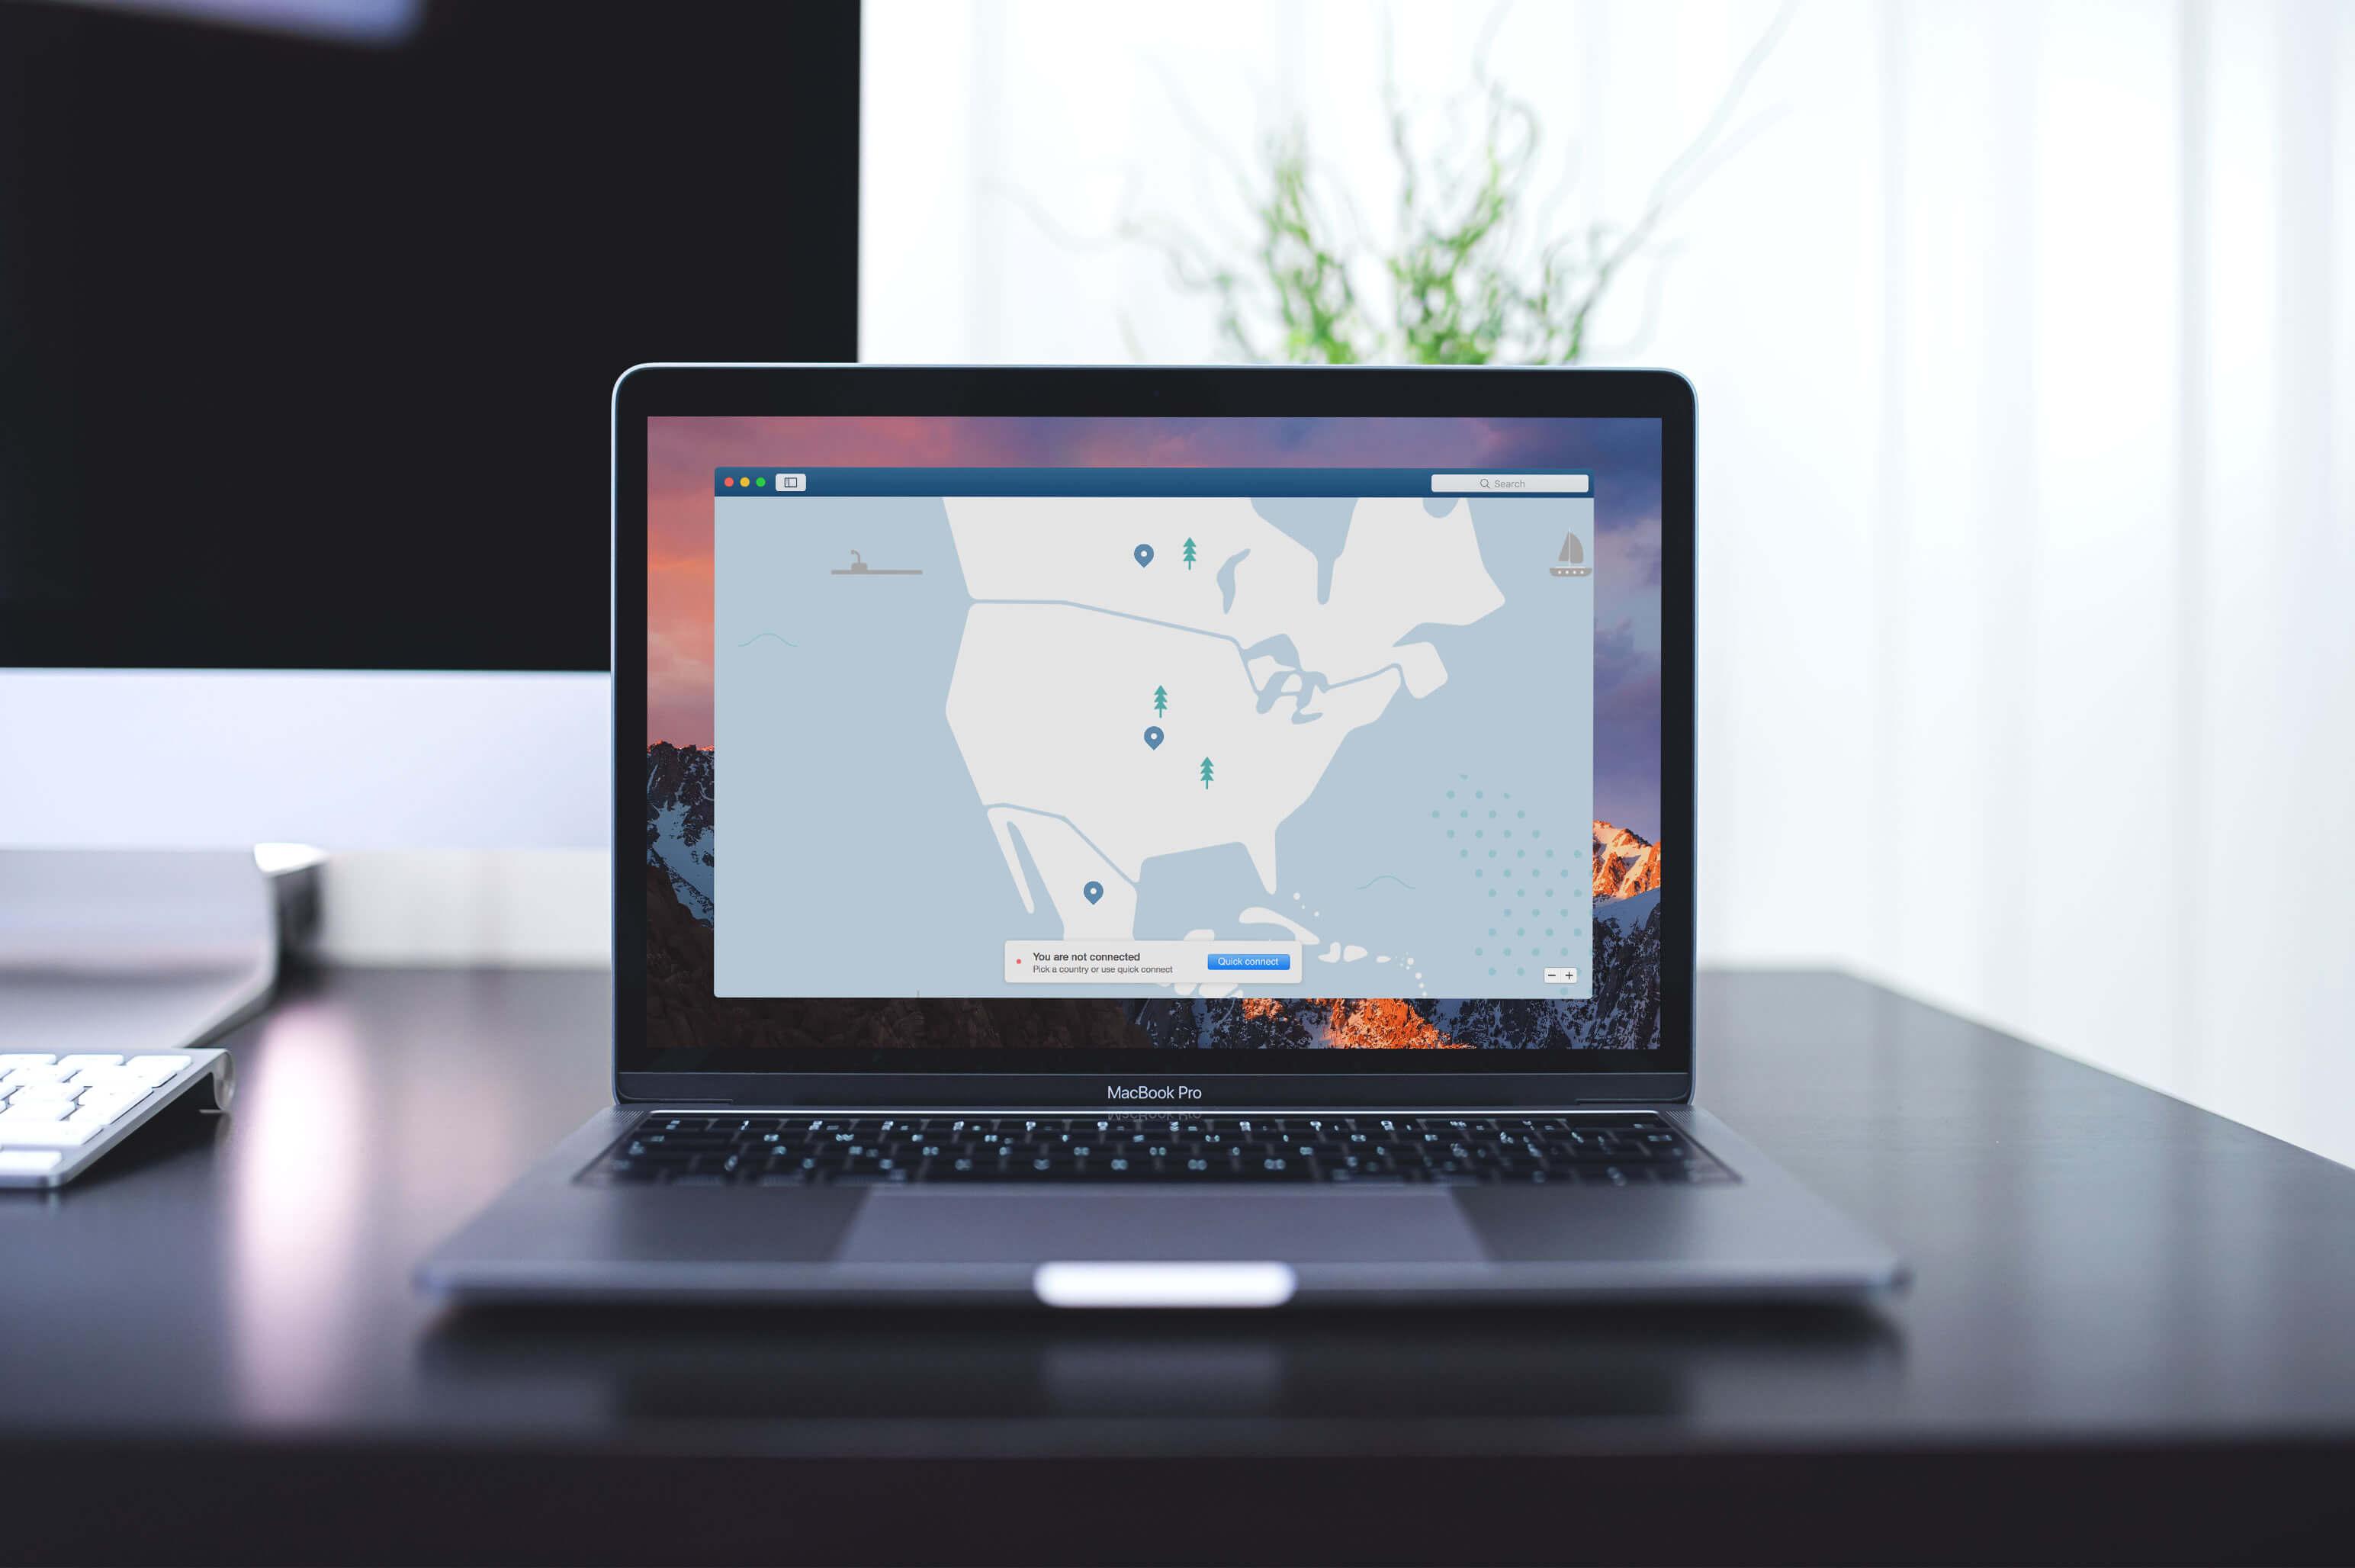 NordVPN on Macbook Pro